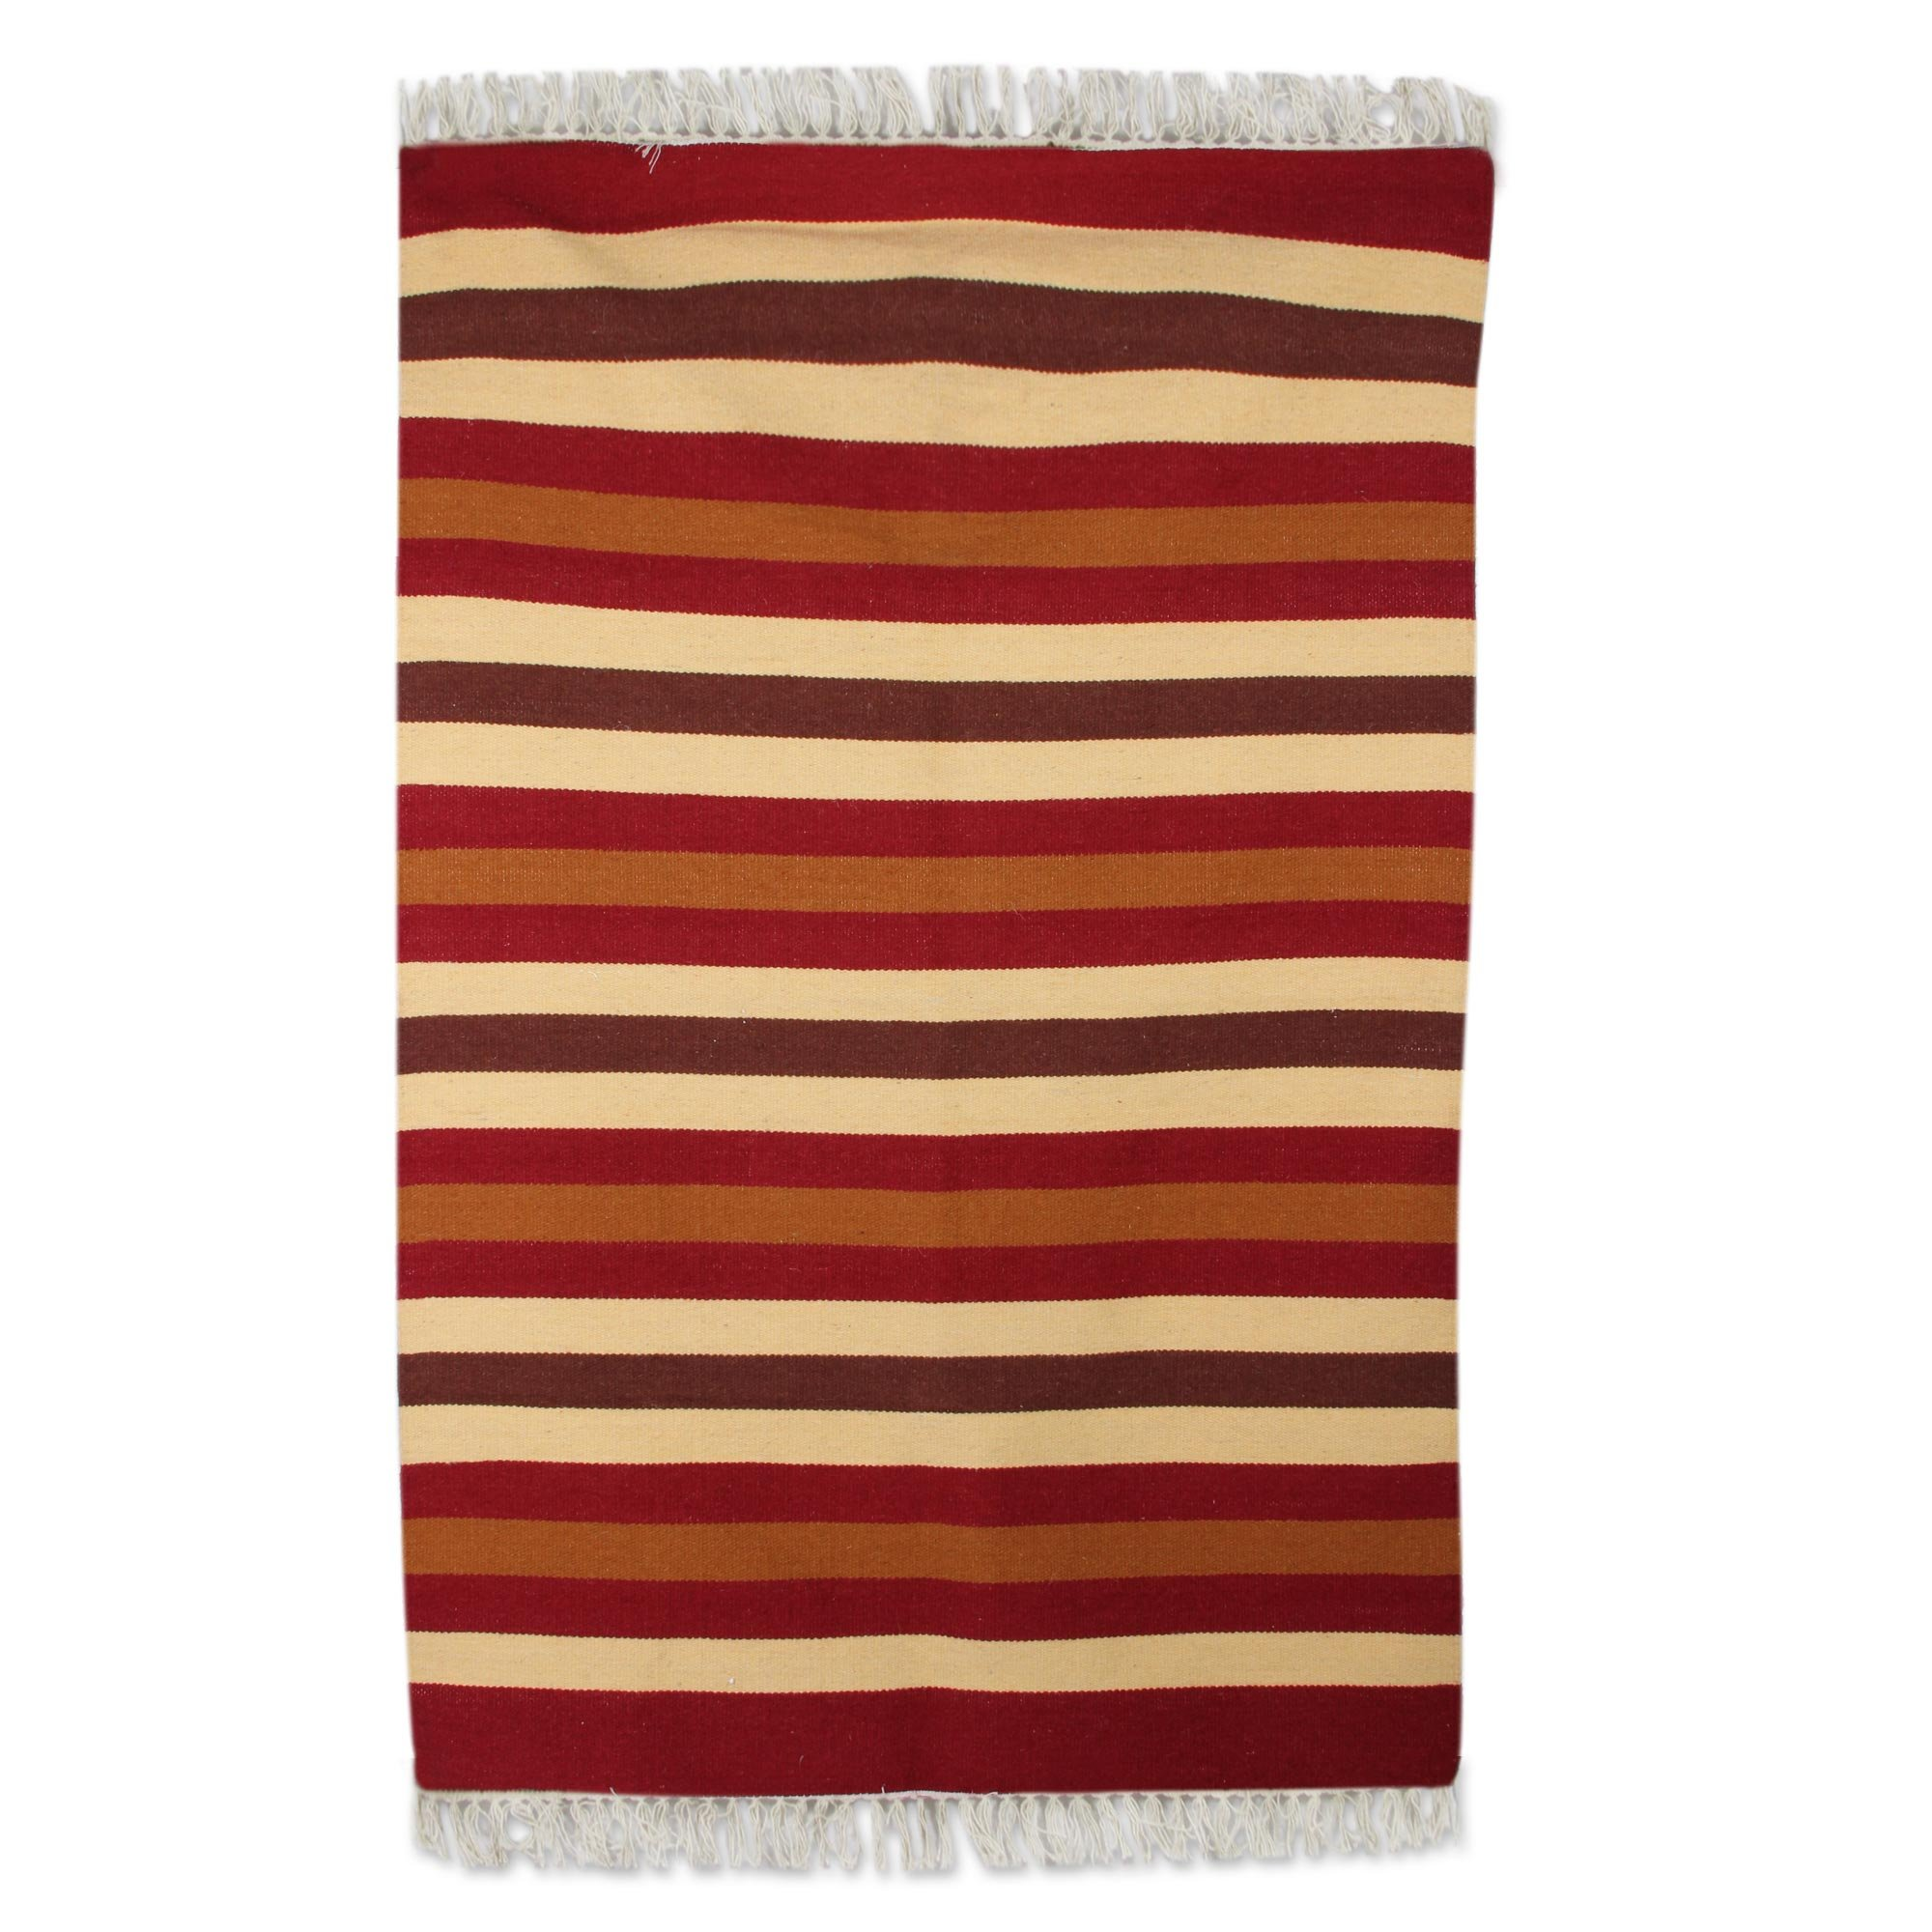 NOVICA Multicolor Wool Hand Woven Solids And Handloom Area Rug (4x6), 'Earthy Path'